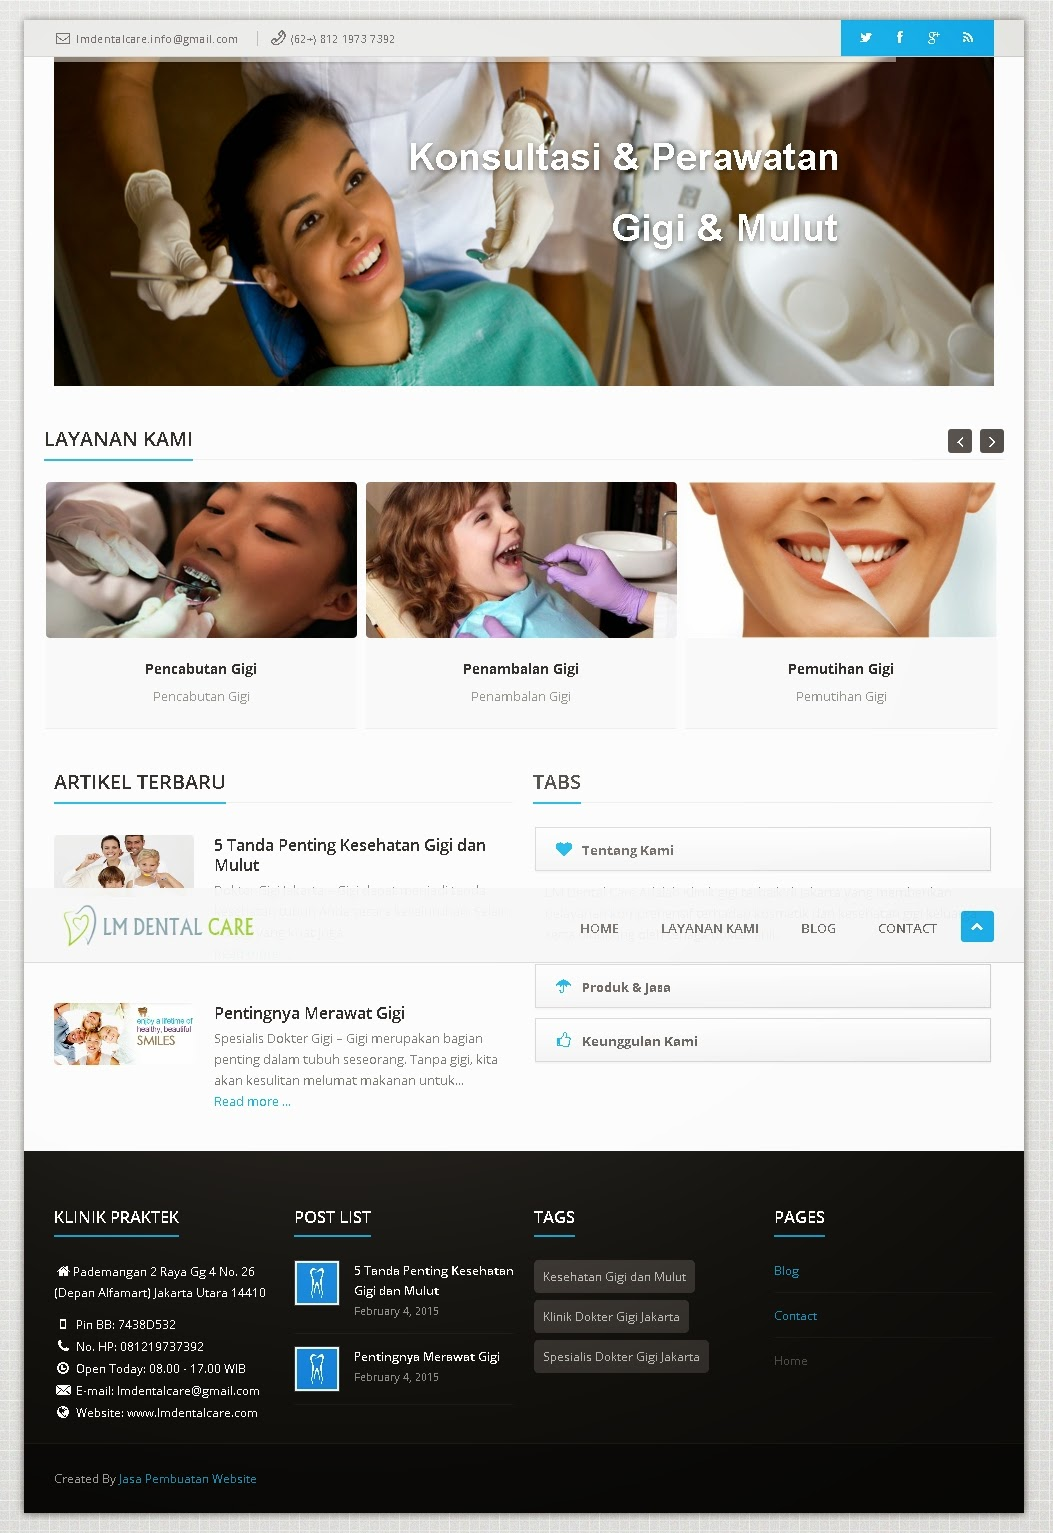 Personal Website Klinik Dokter Gigi